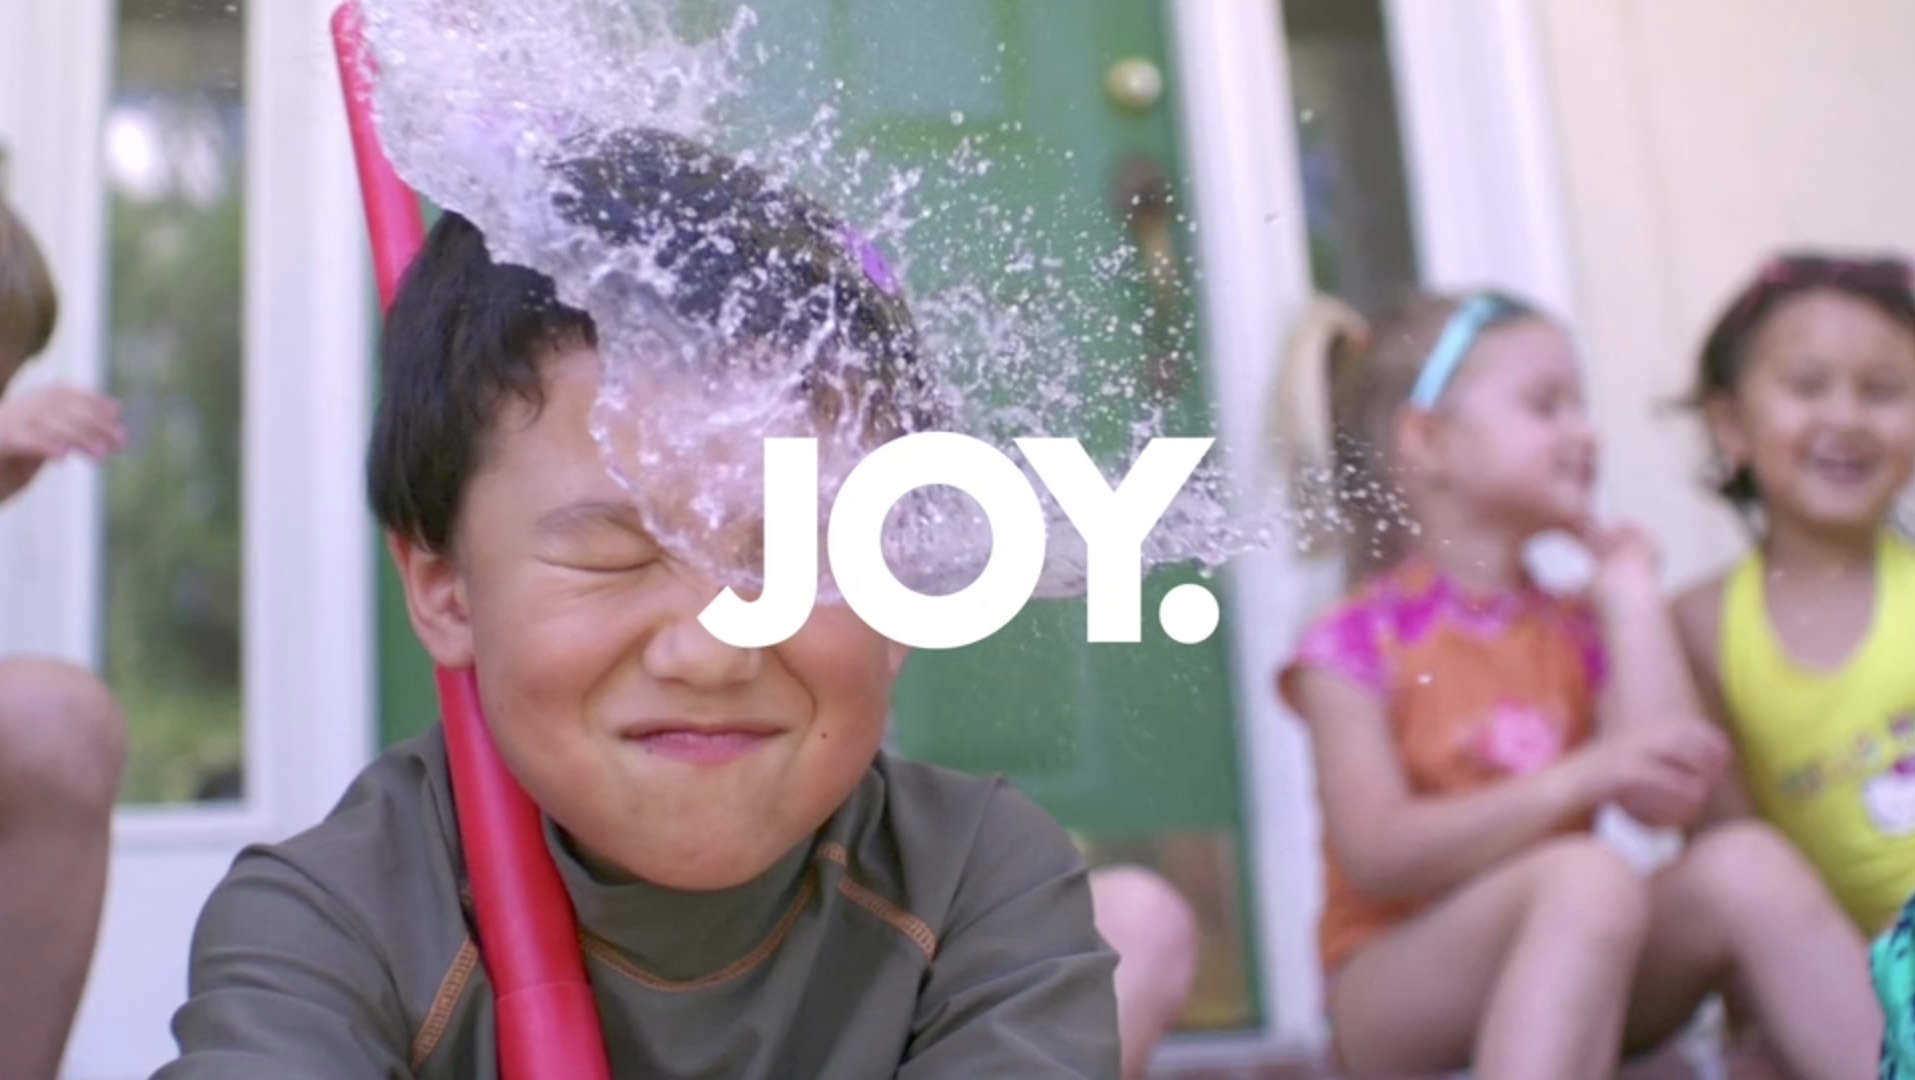 JOY waterbomb.jpg